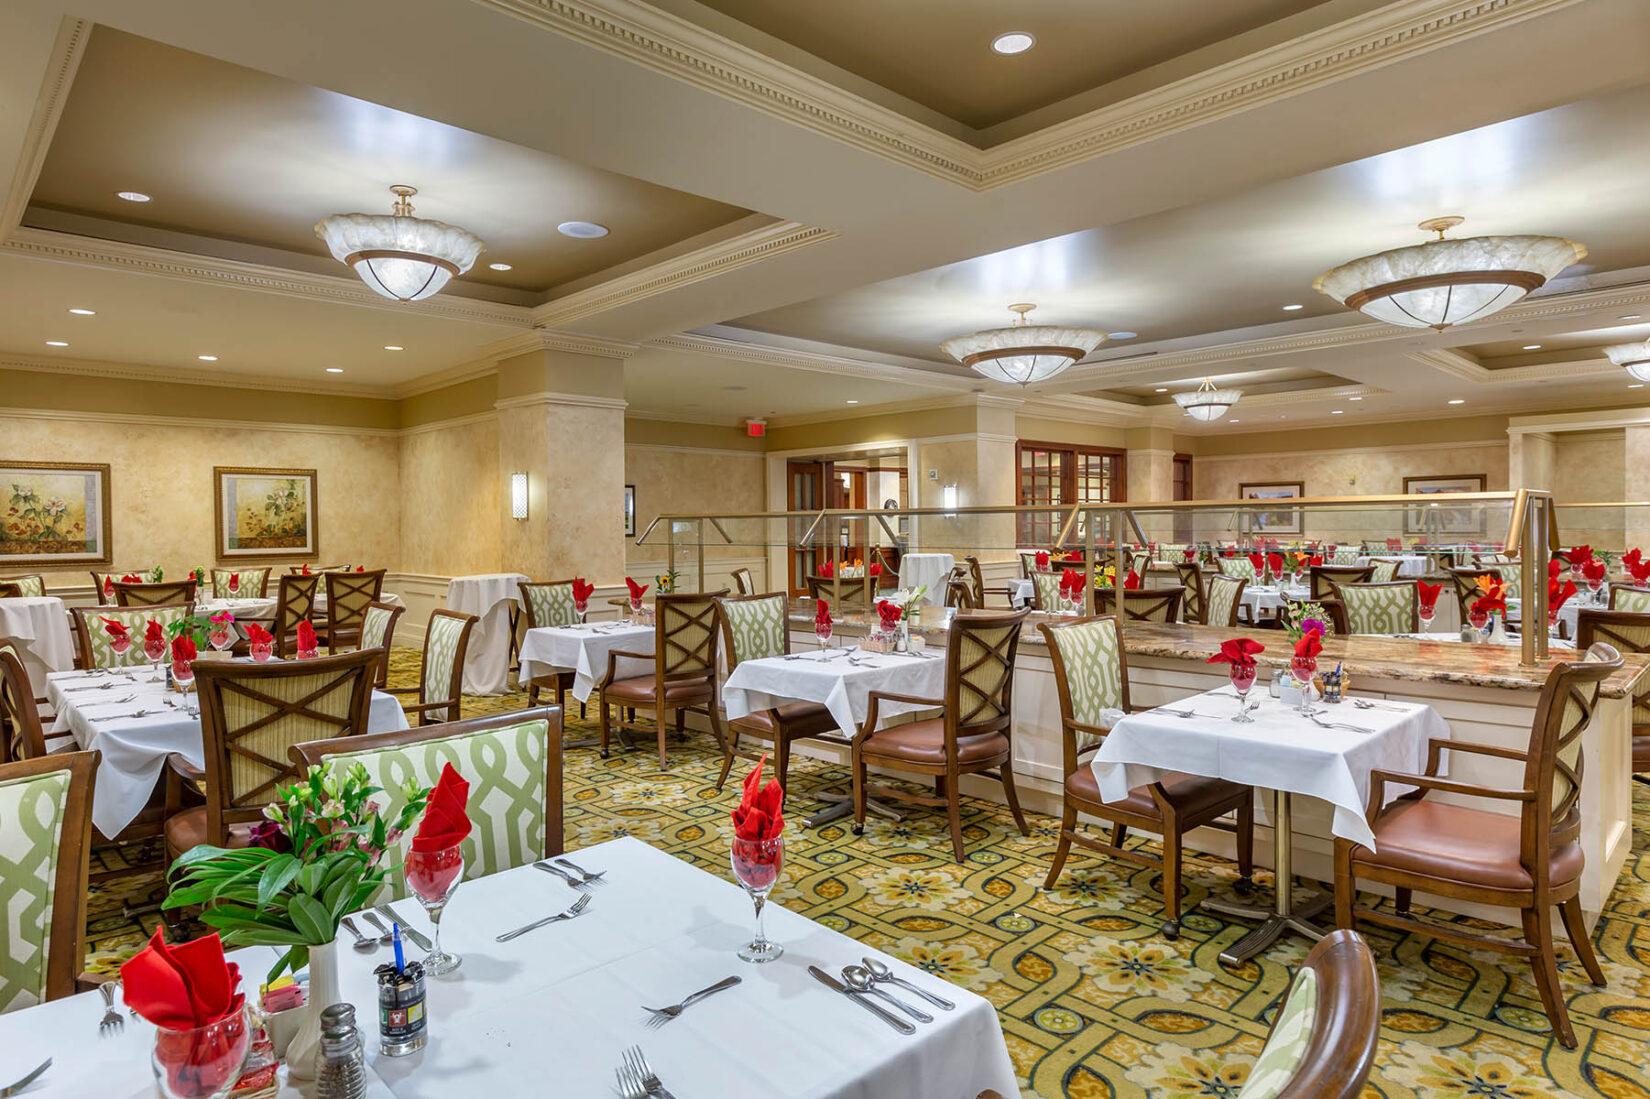 Upscale Senior Living Dining Room Area